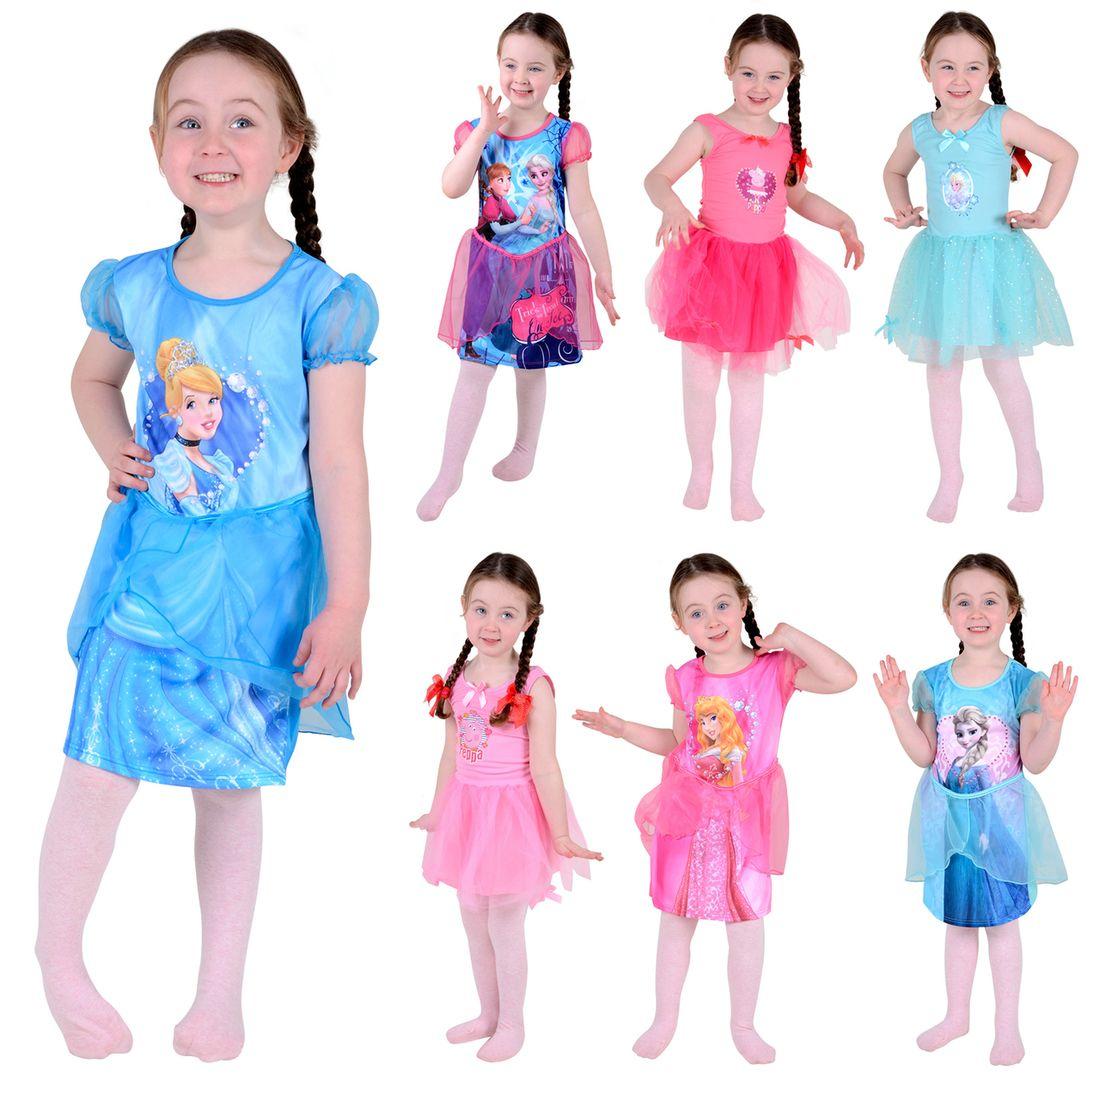 Little girls ballerina dresses, £1 each at XS-STOCK  (+£3.99 p&p per order)